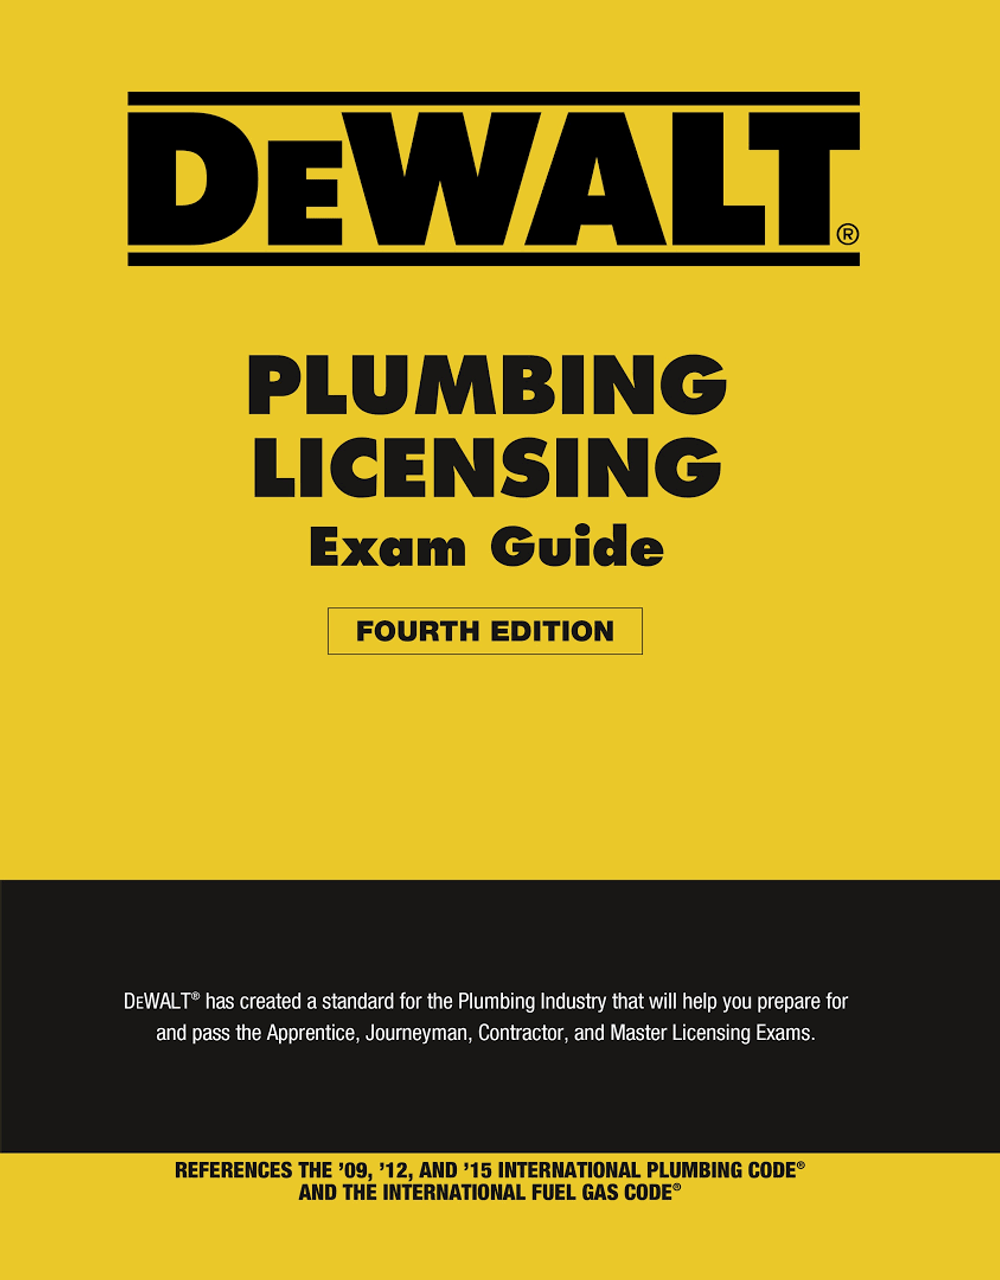 Dewalt Plumbing Licensing Exam Guide 4th Edition Psi Online Store